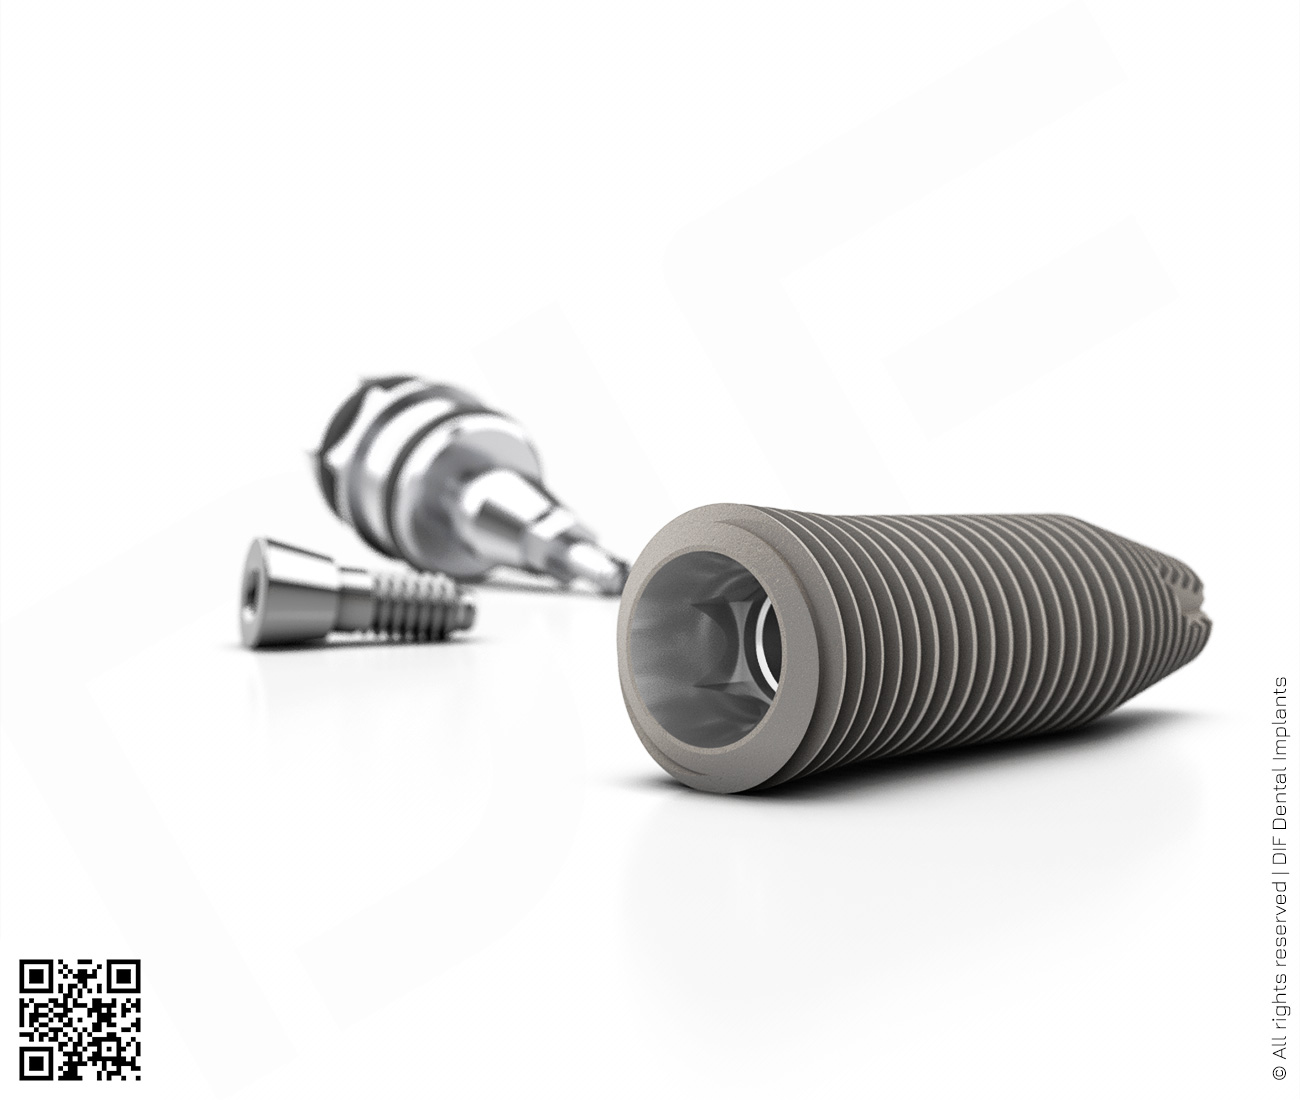 Фото имплантат mainstream fine d5.0 мм – l16.0 мм  производства DIF.